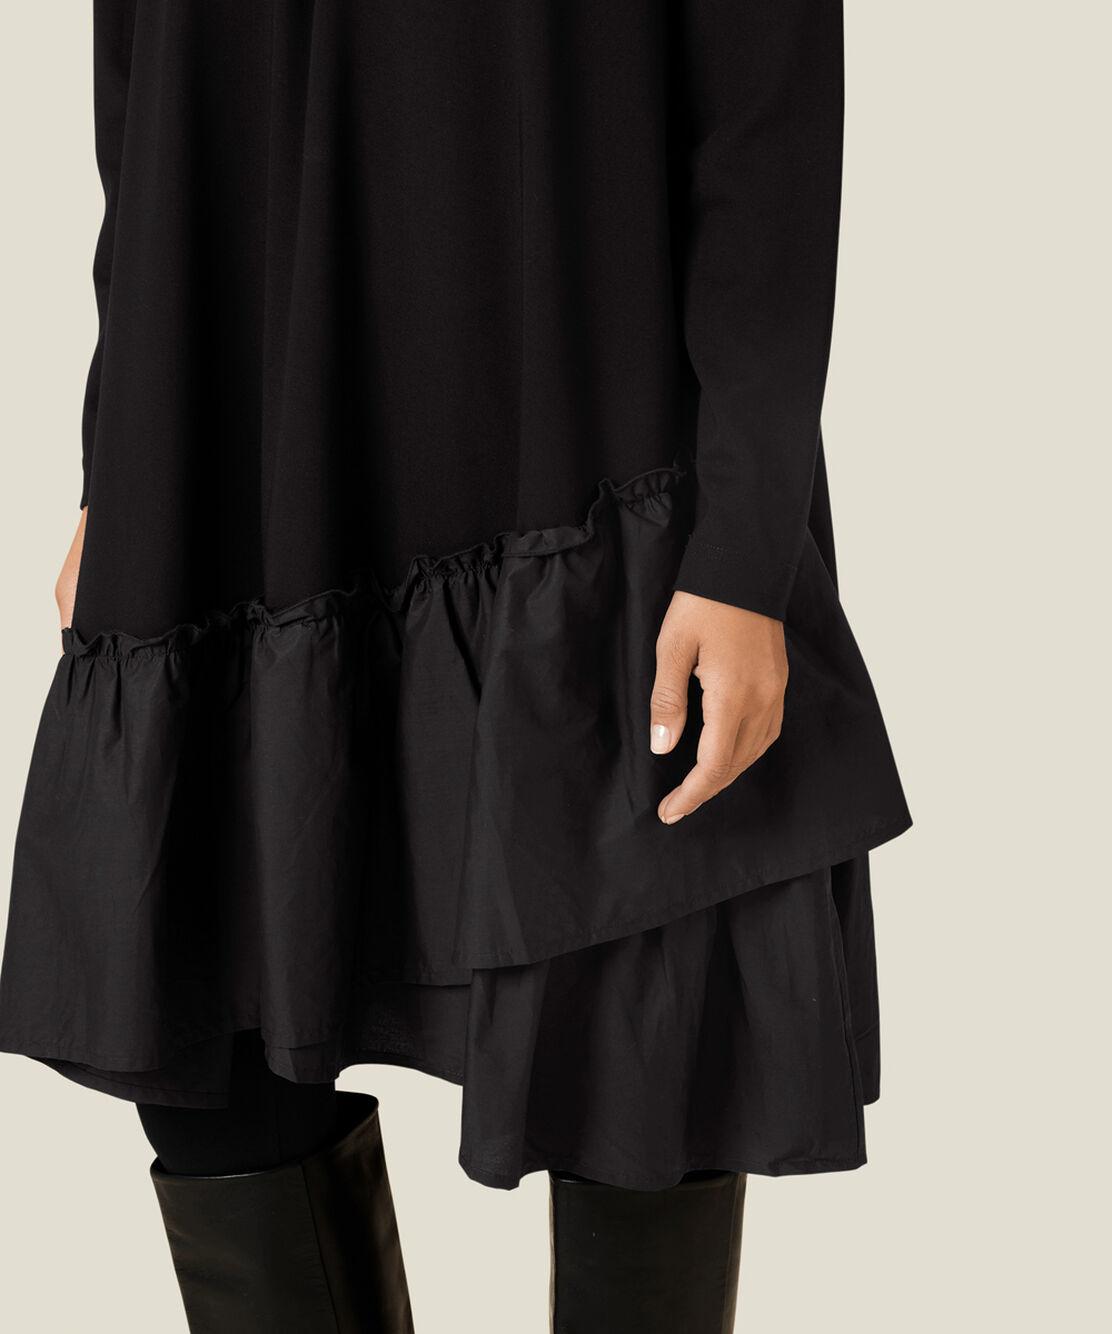 NELL JERSEY DRESS, Black, hi-res